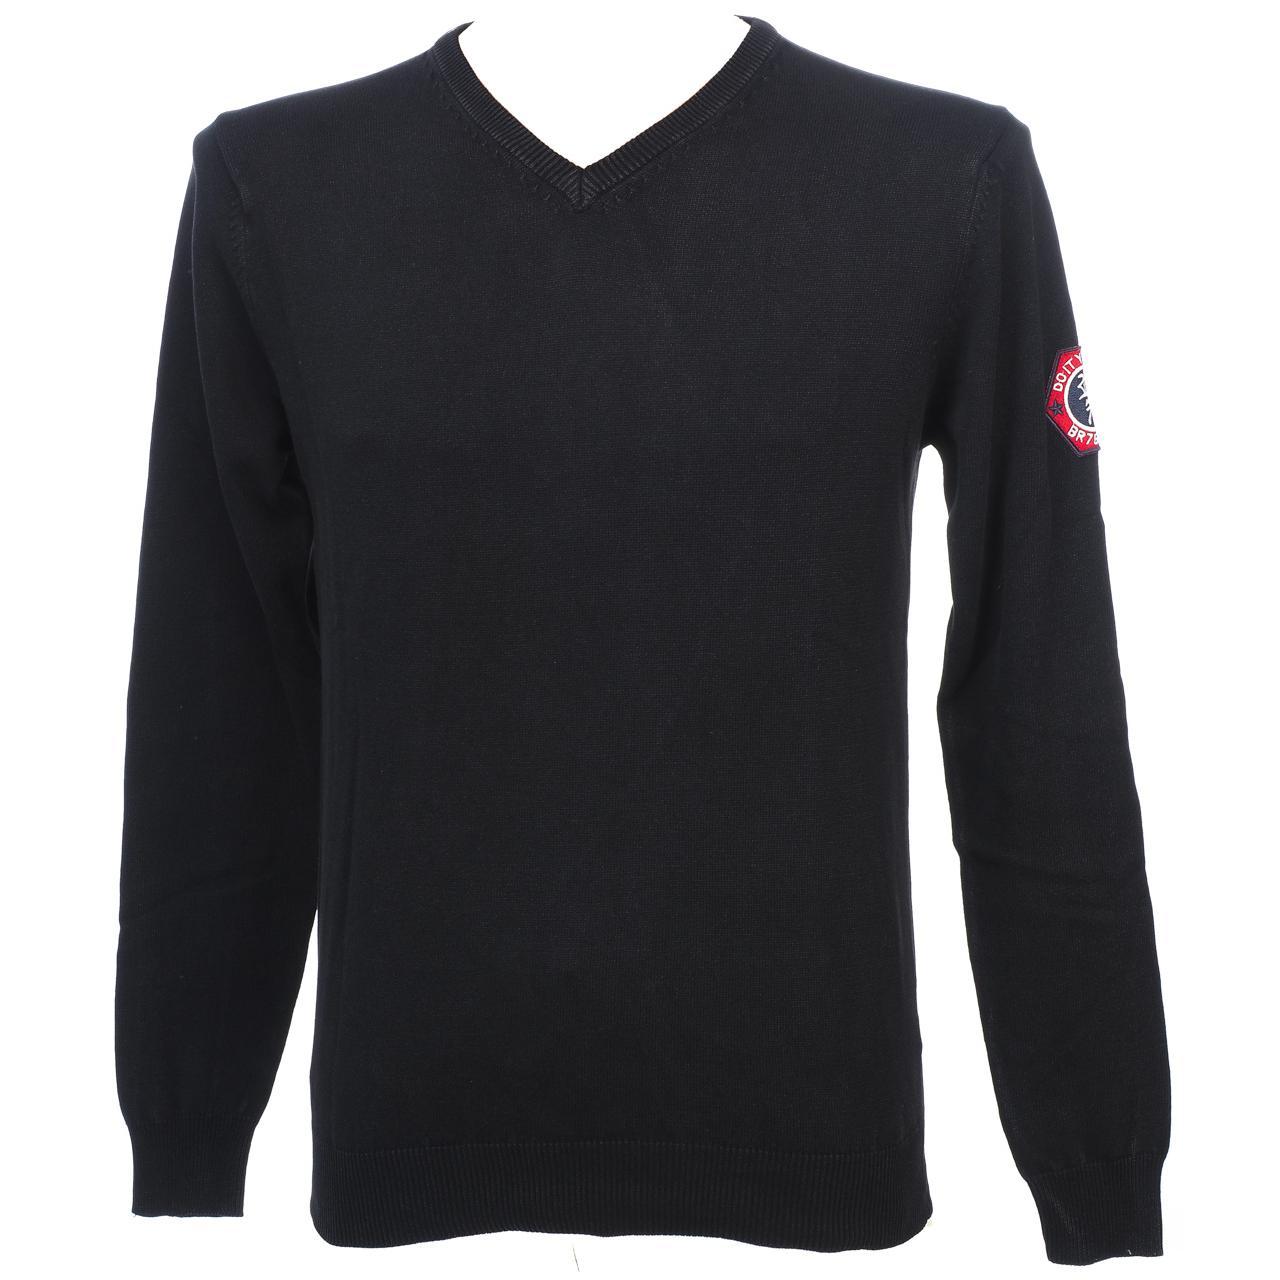 Pull-fin-Rivaldi-black-Gilianu-anthra-pull-Gris-79338-Neuf